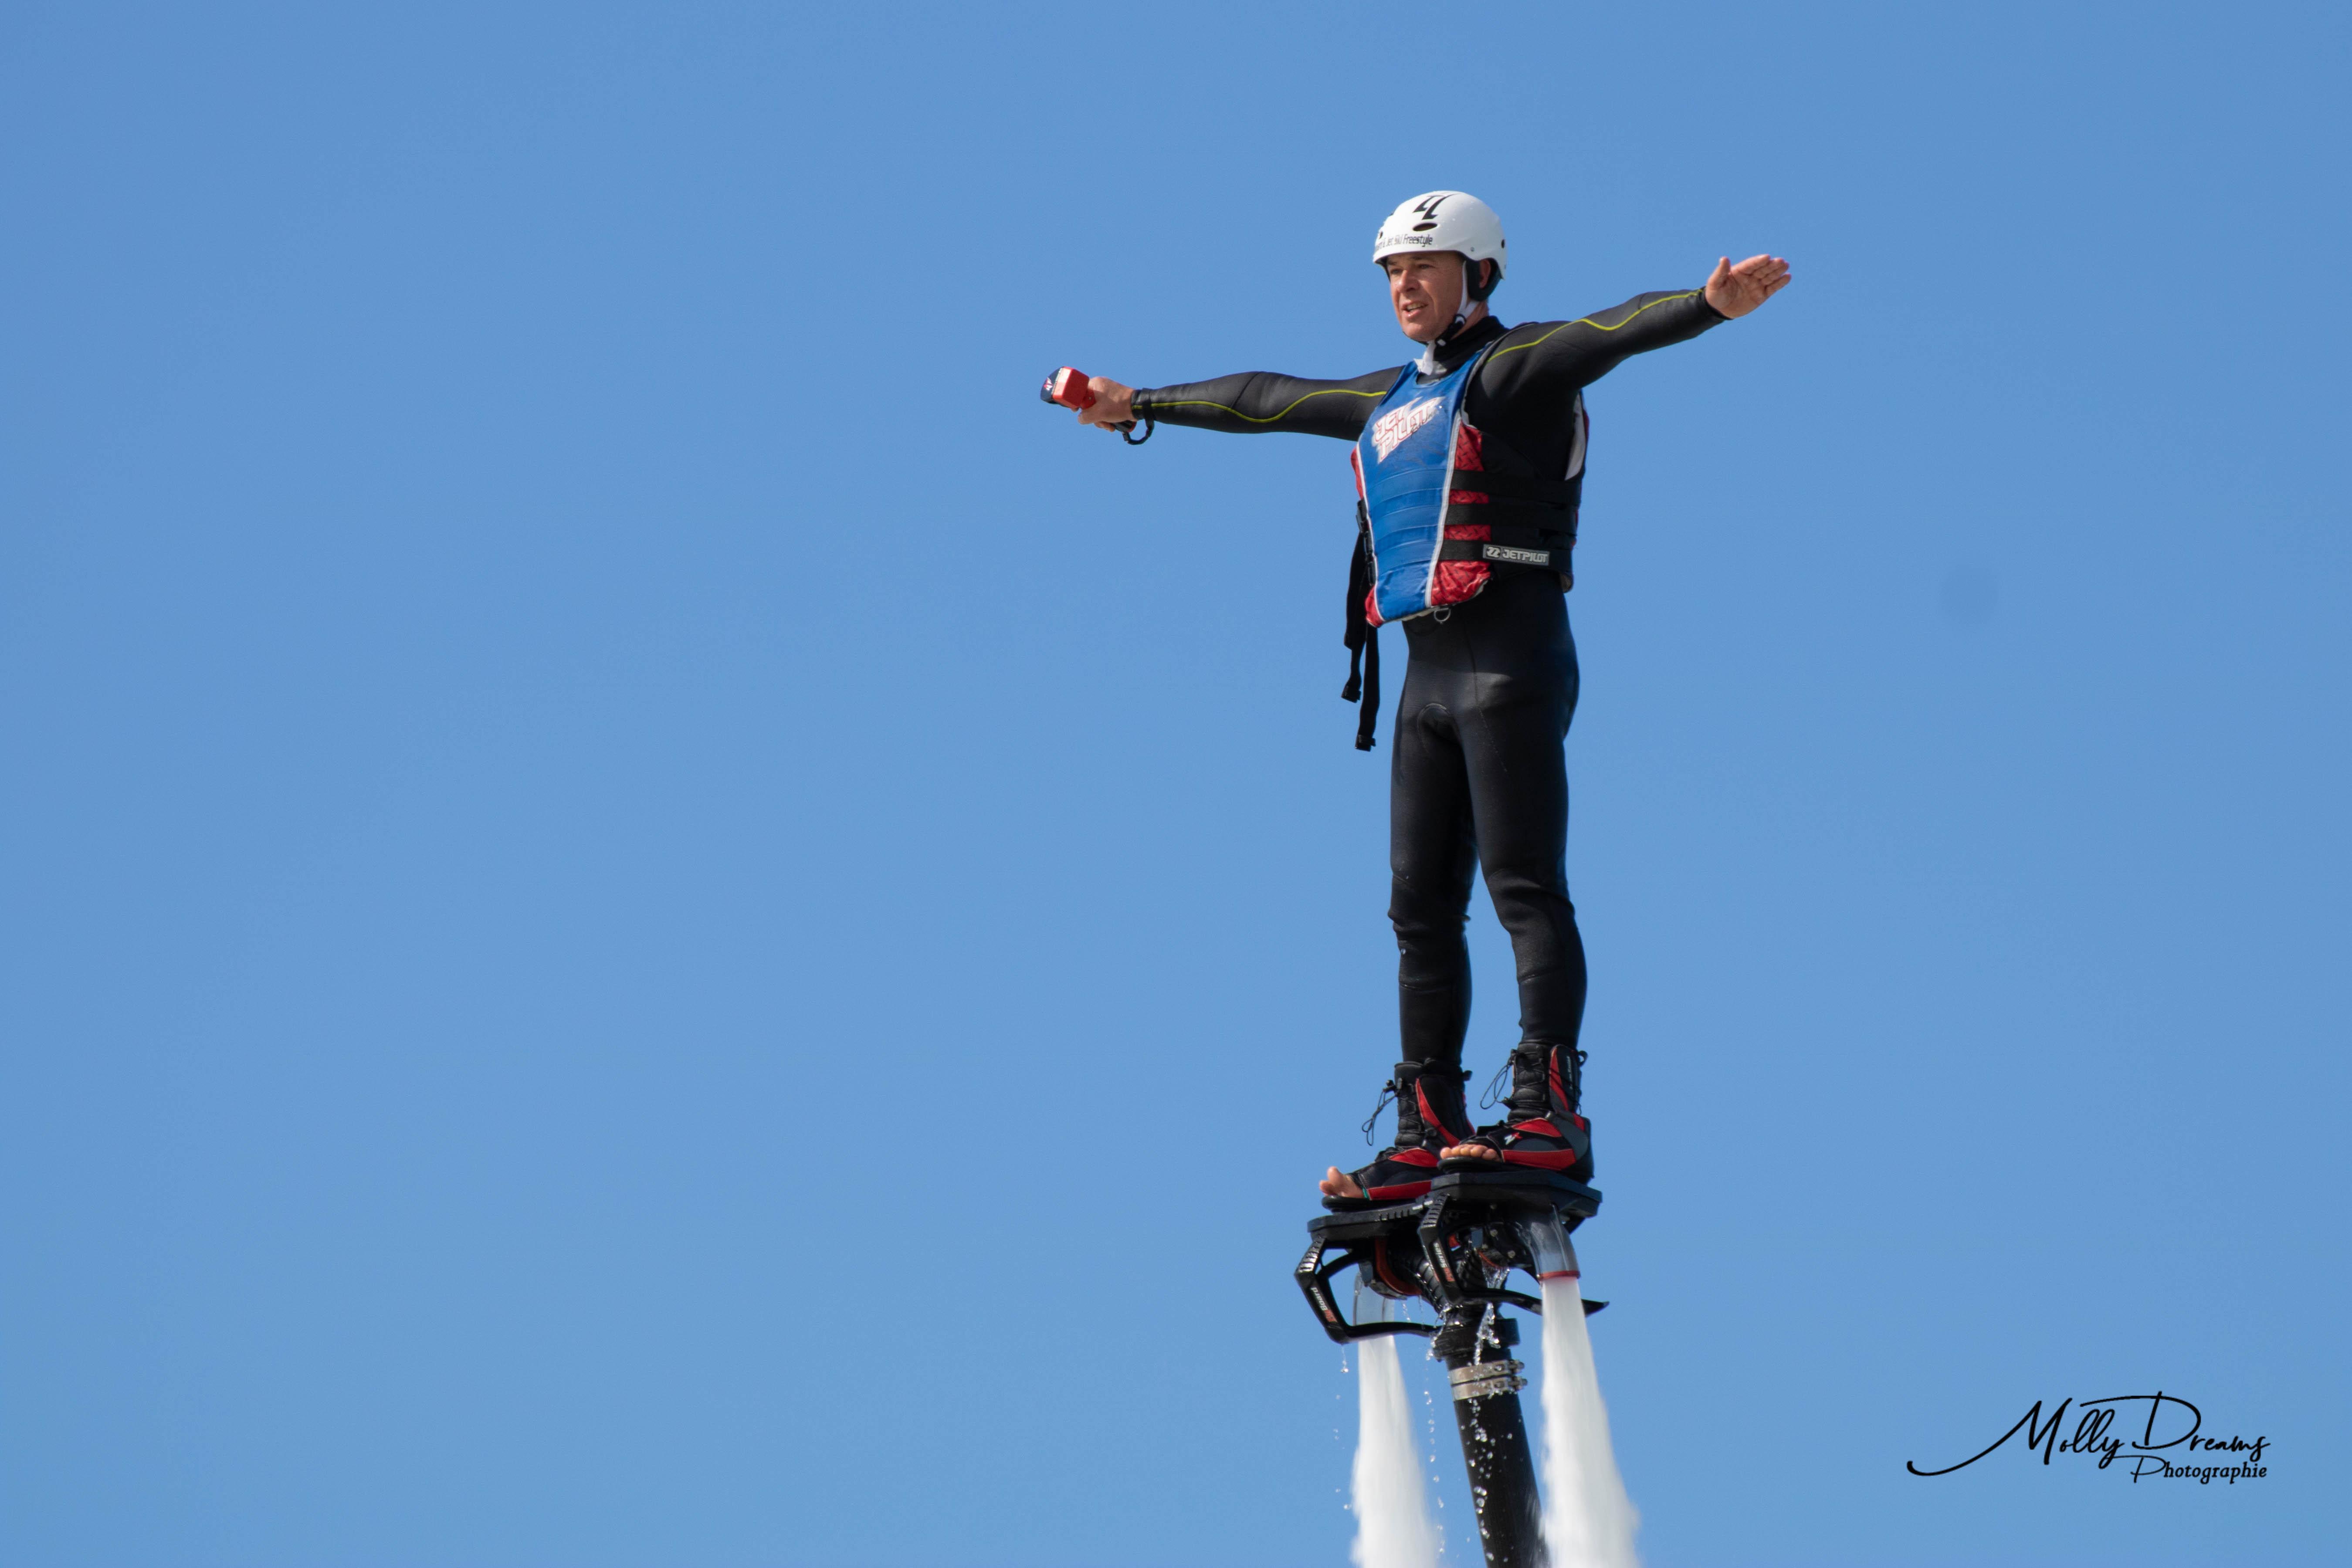 jet ski 2020 villers sur mer molly dreams